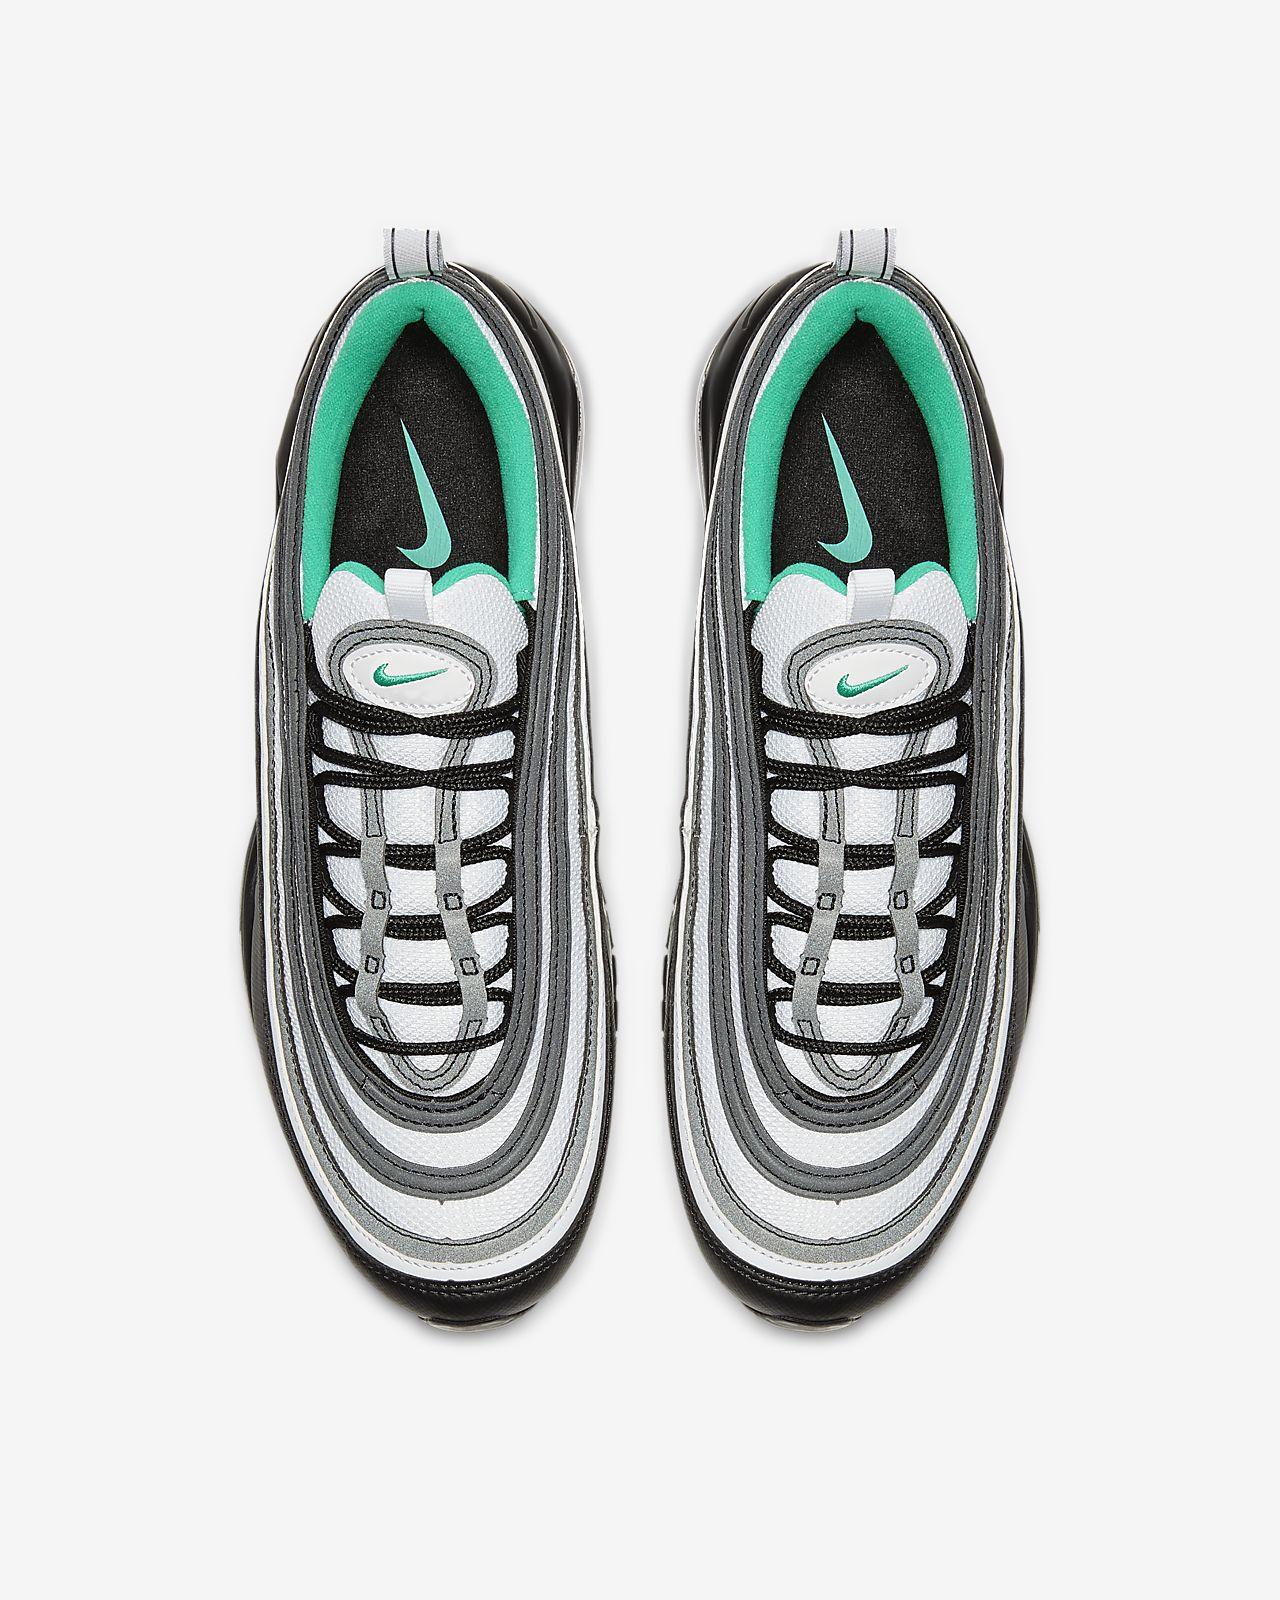 quality design 9f7df d3683 ... Chaussure Nike Air Max 97 pour Homme